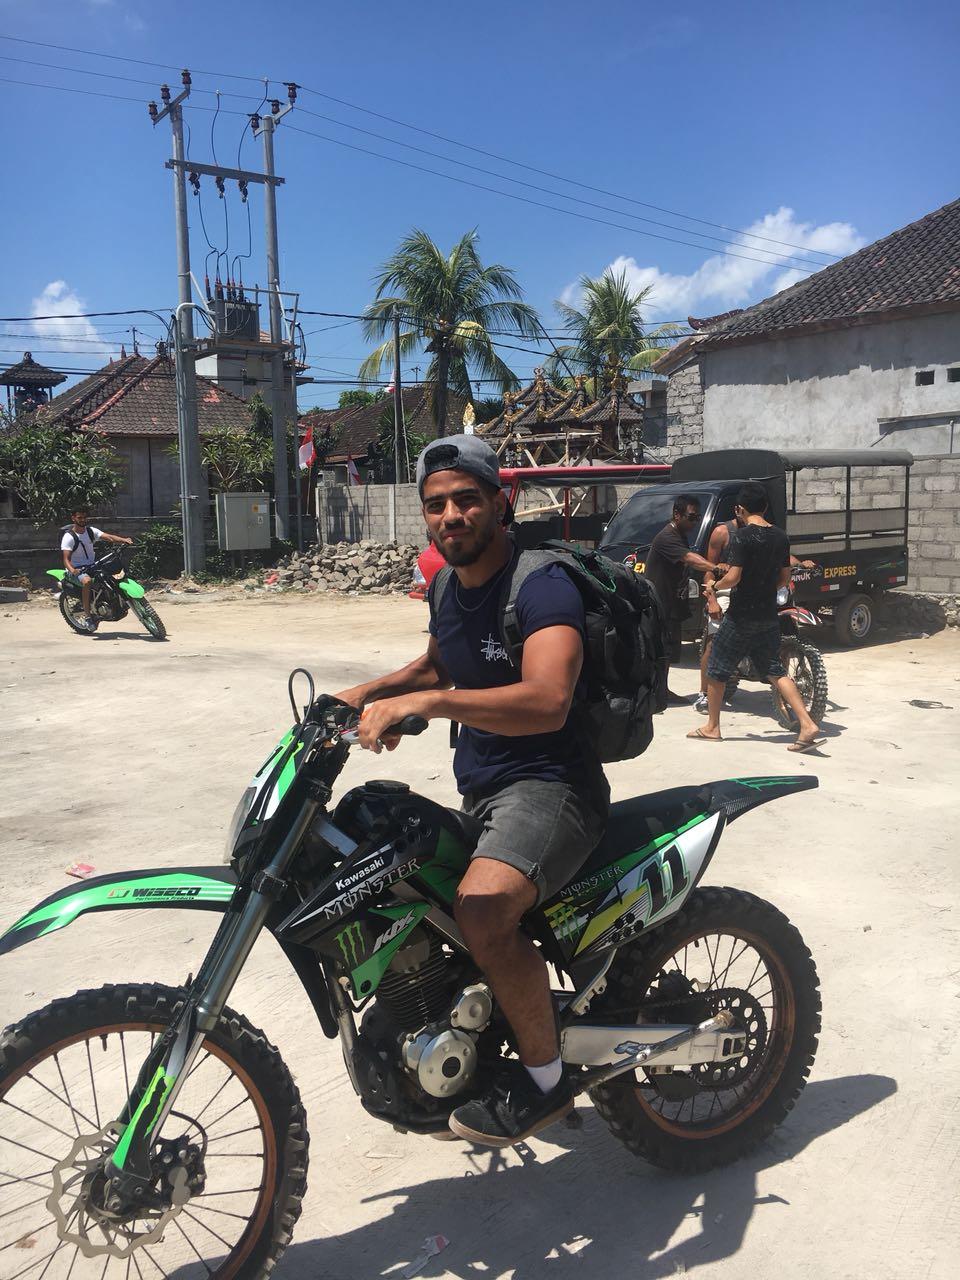 Rental Sewa Motor Di Bali 2019 Promo Rp 35000 Hotel Duo Legian Kuta Nusa Lembongan